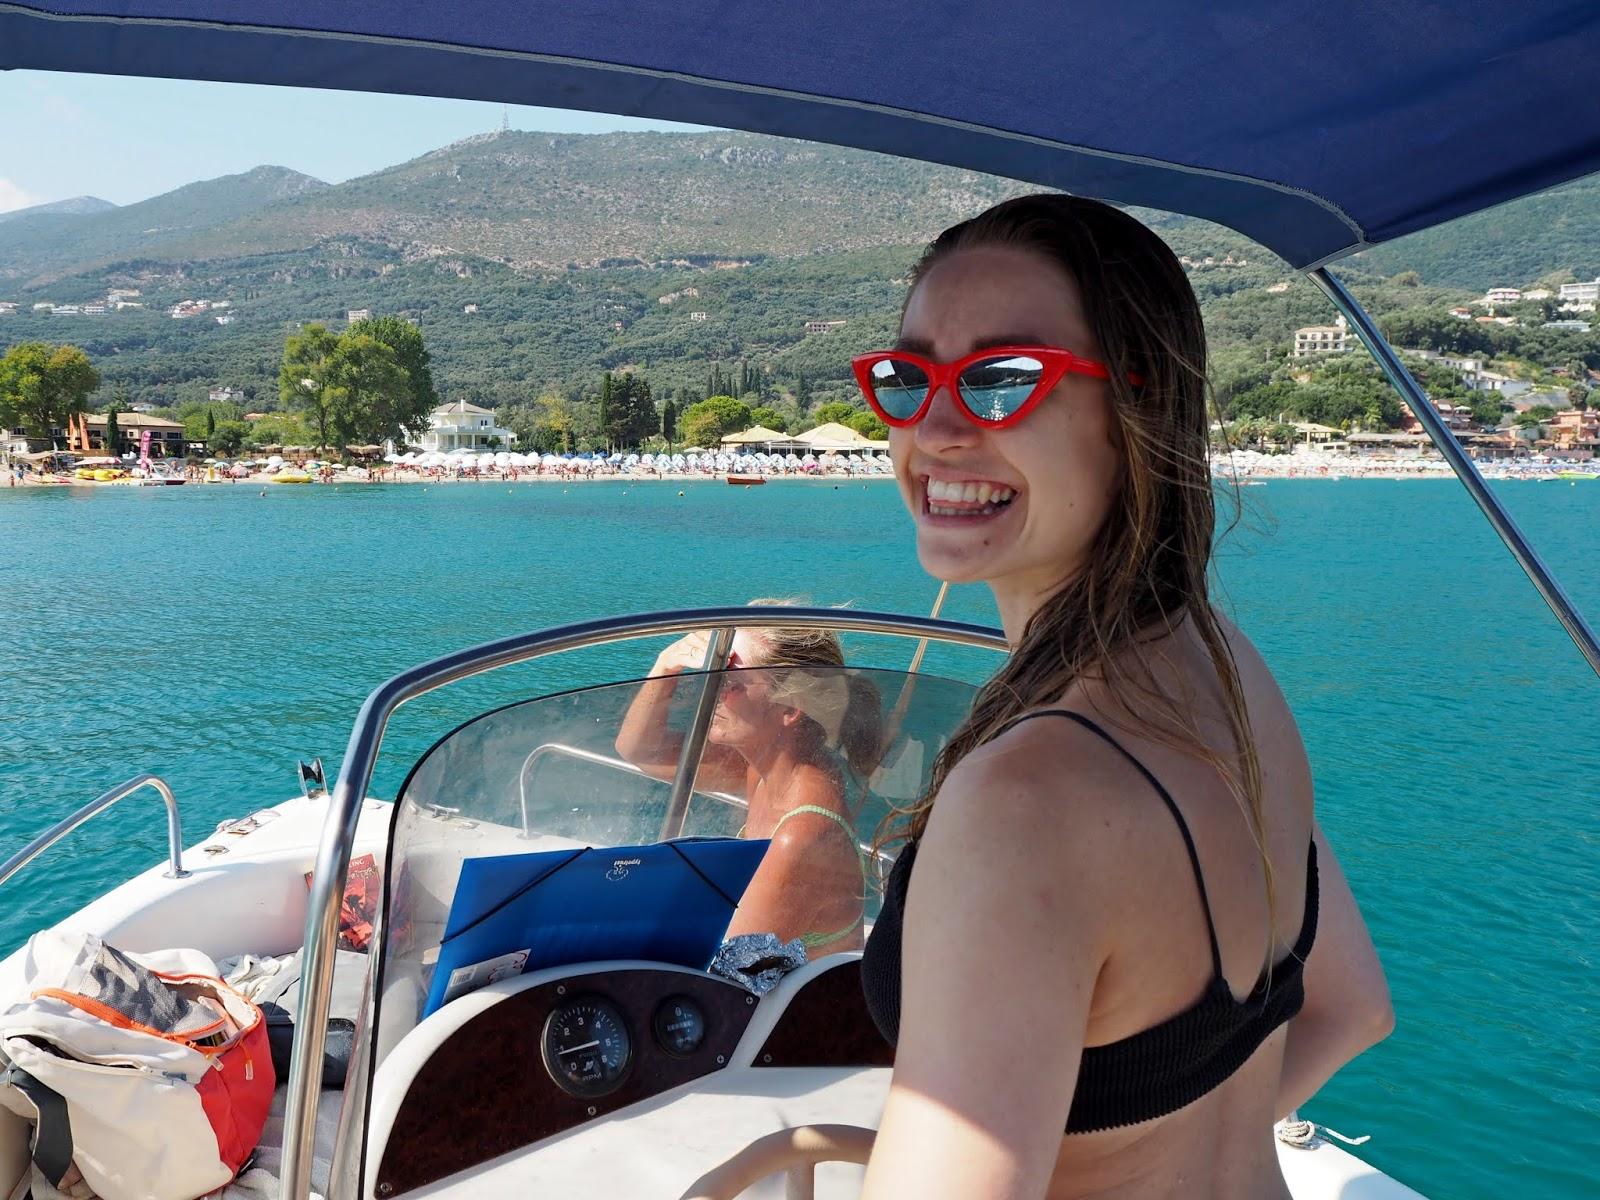 Girl driving boat